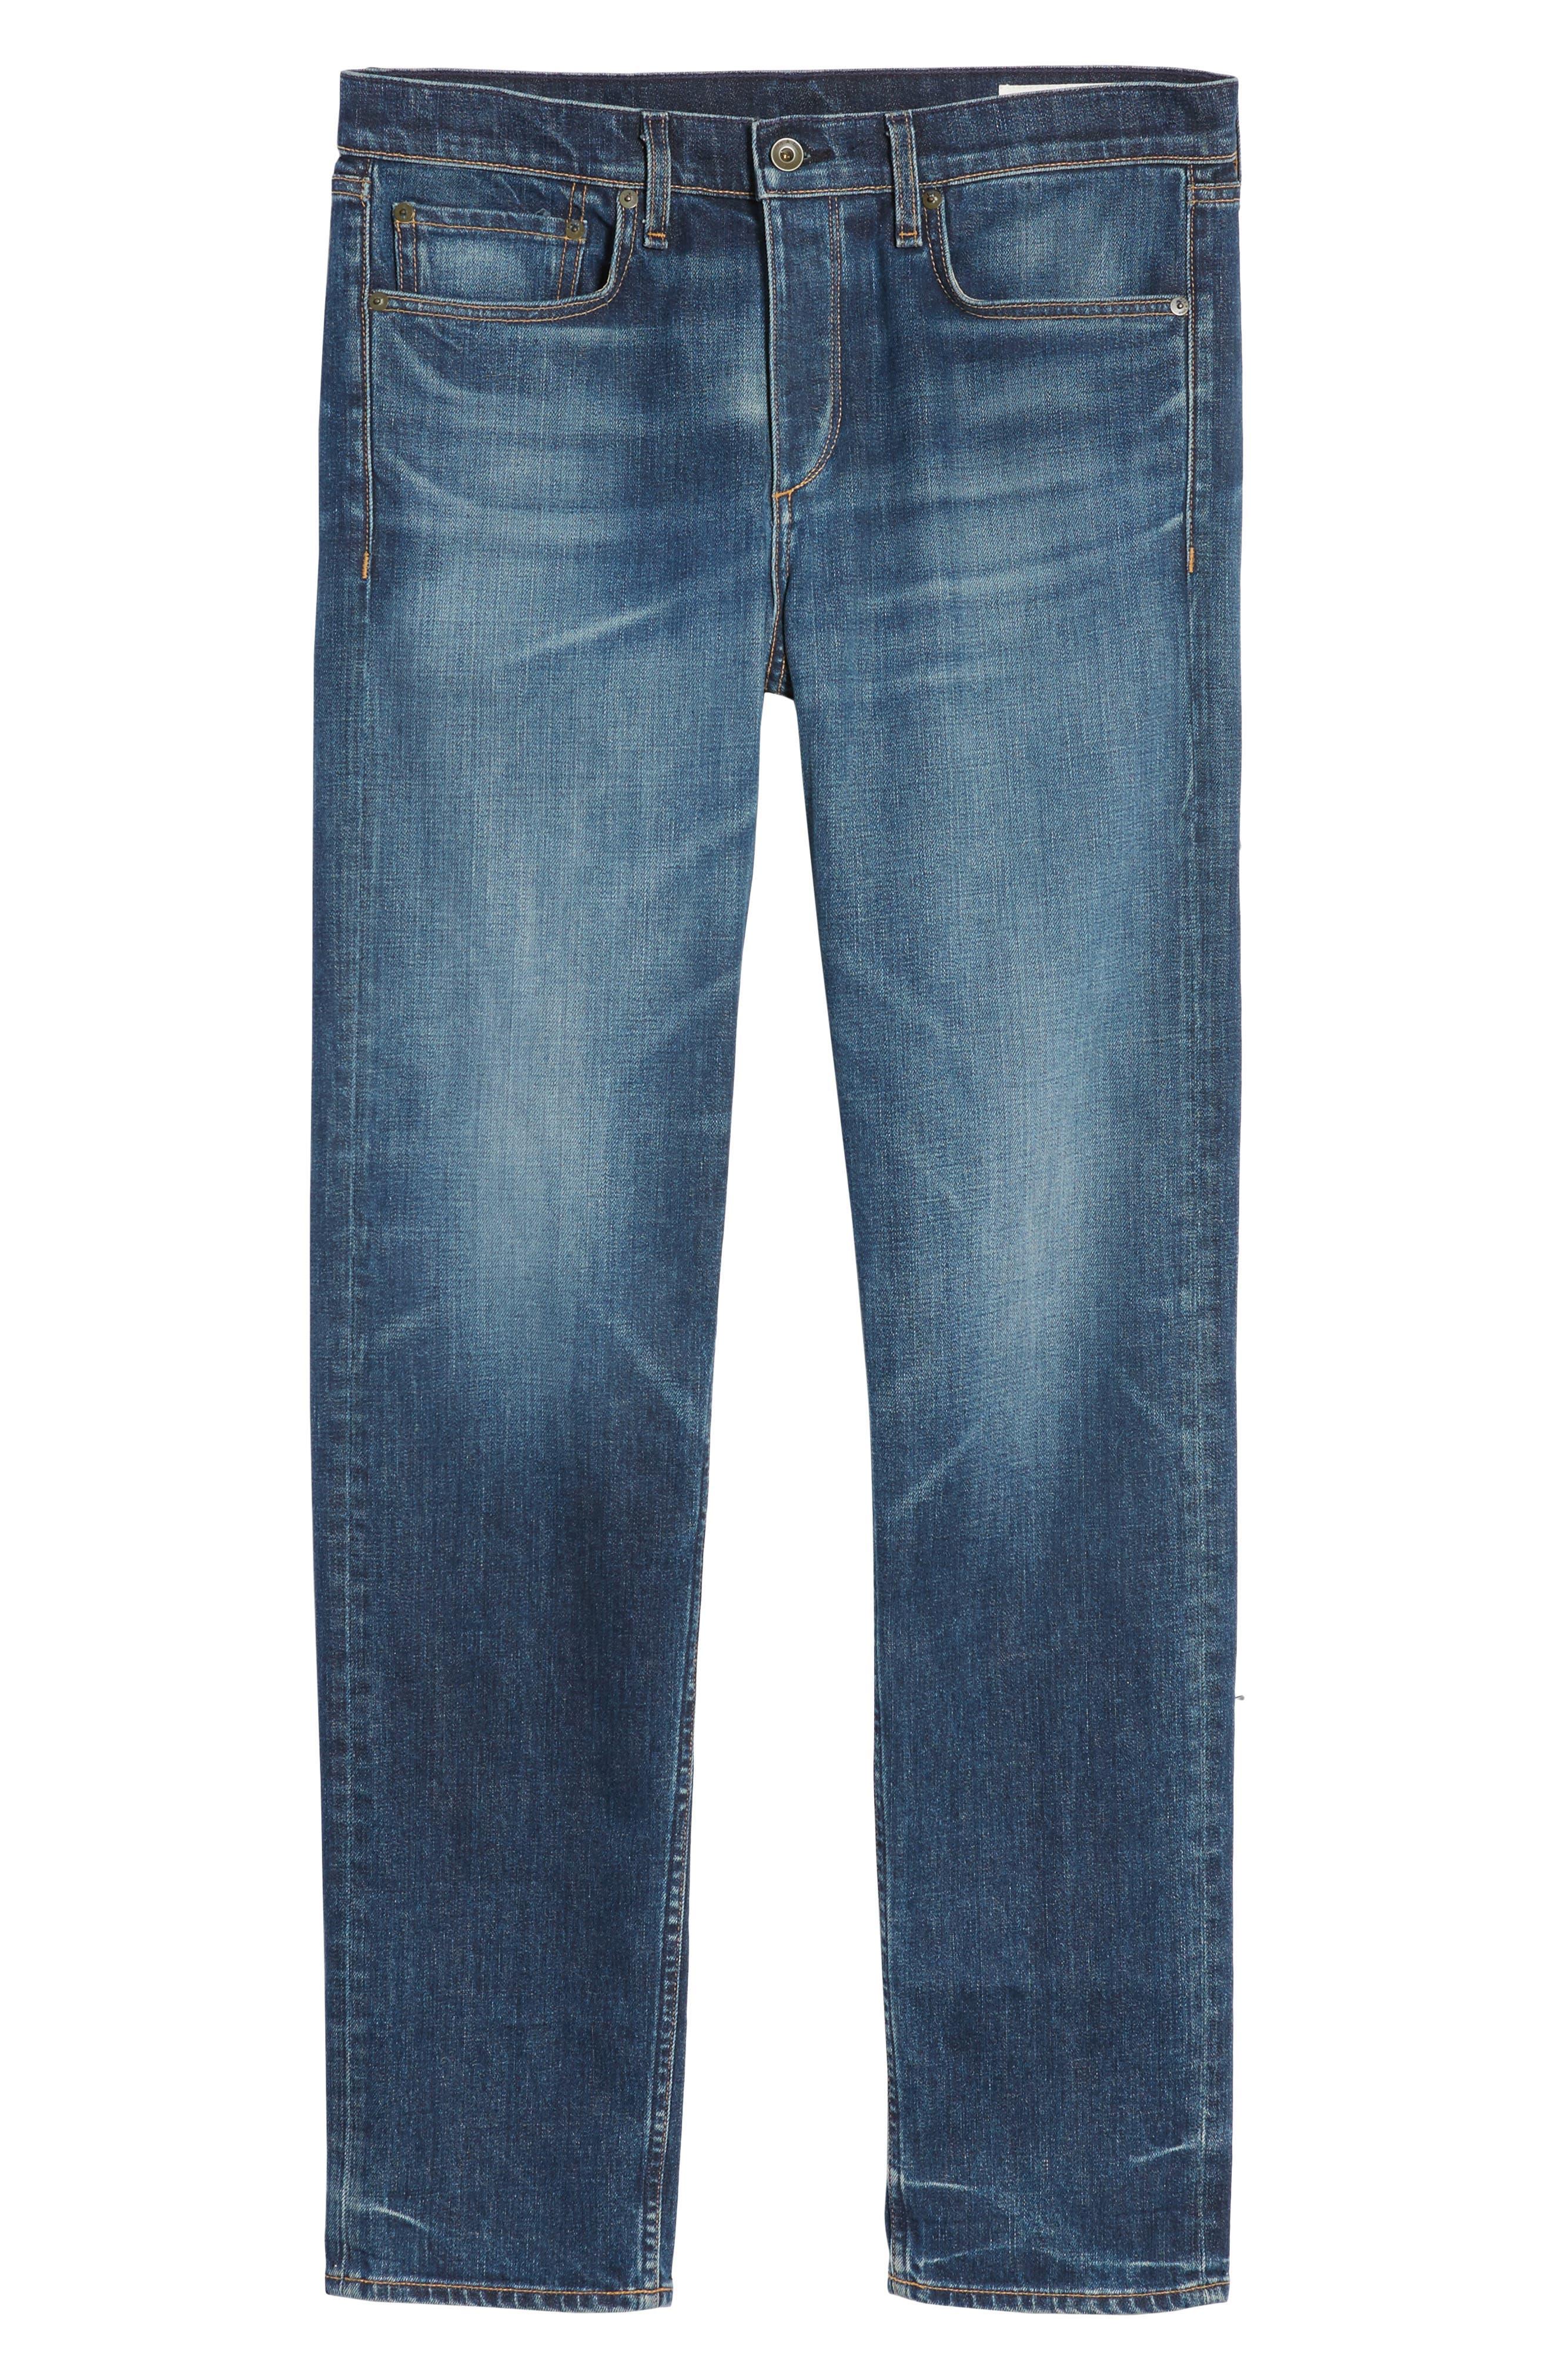 Fit 3 Slim Straight Leg Jeans,                             Alternate thumbnail 6, color,                             Linden